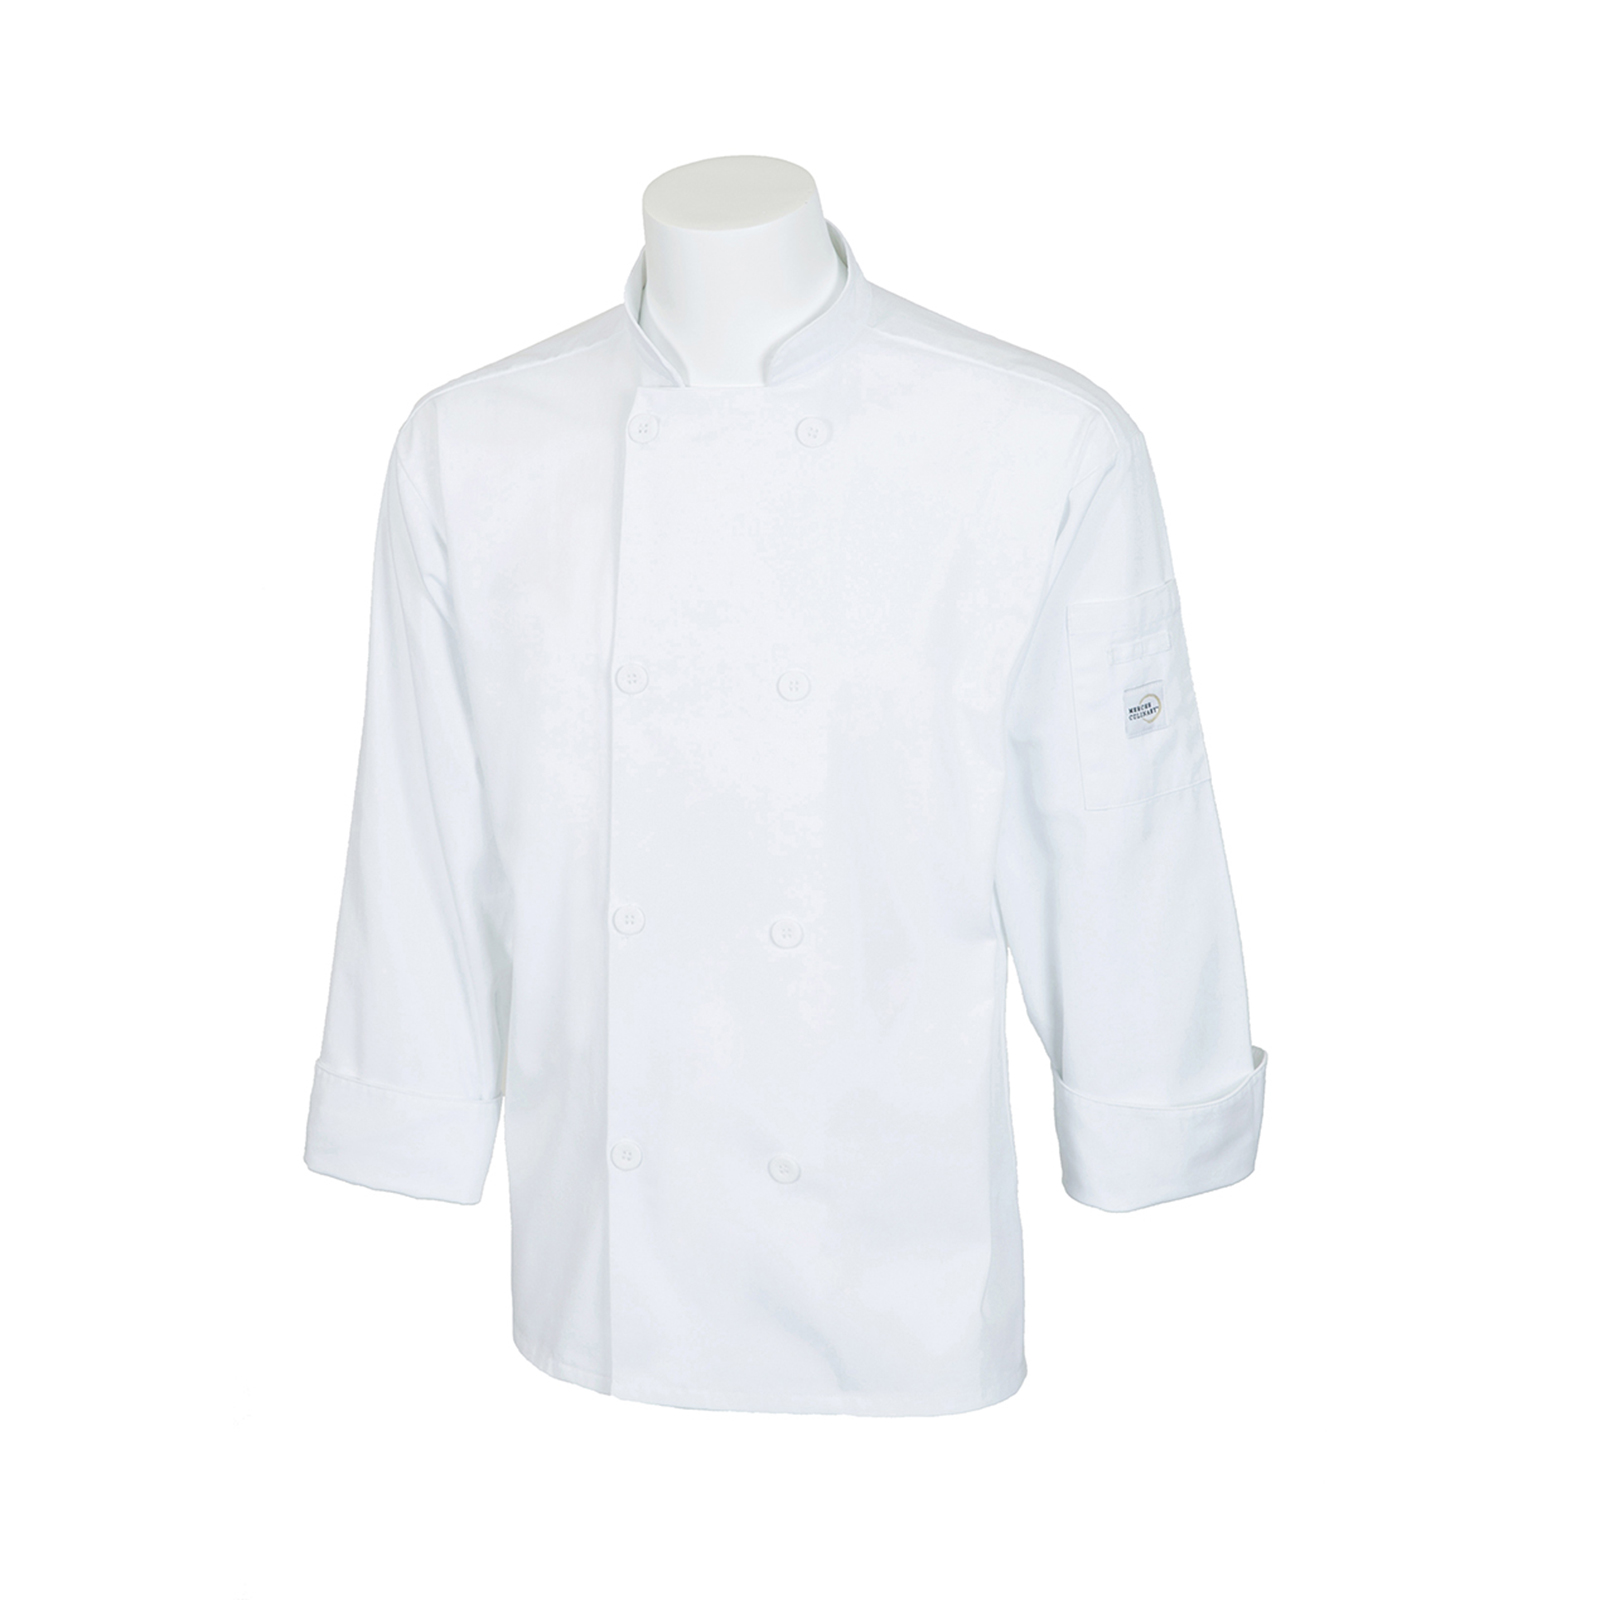 Mercer Culinary M60010WH1X chef's coat